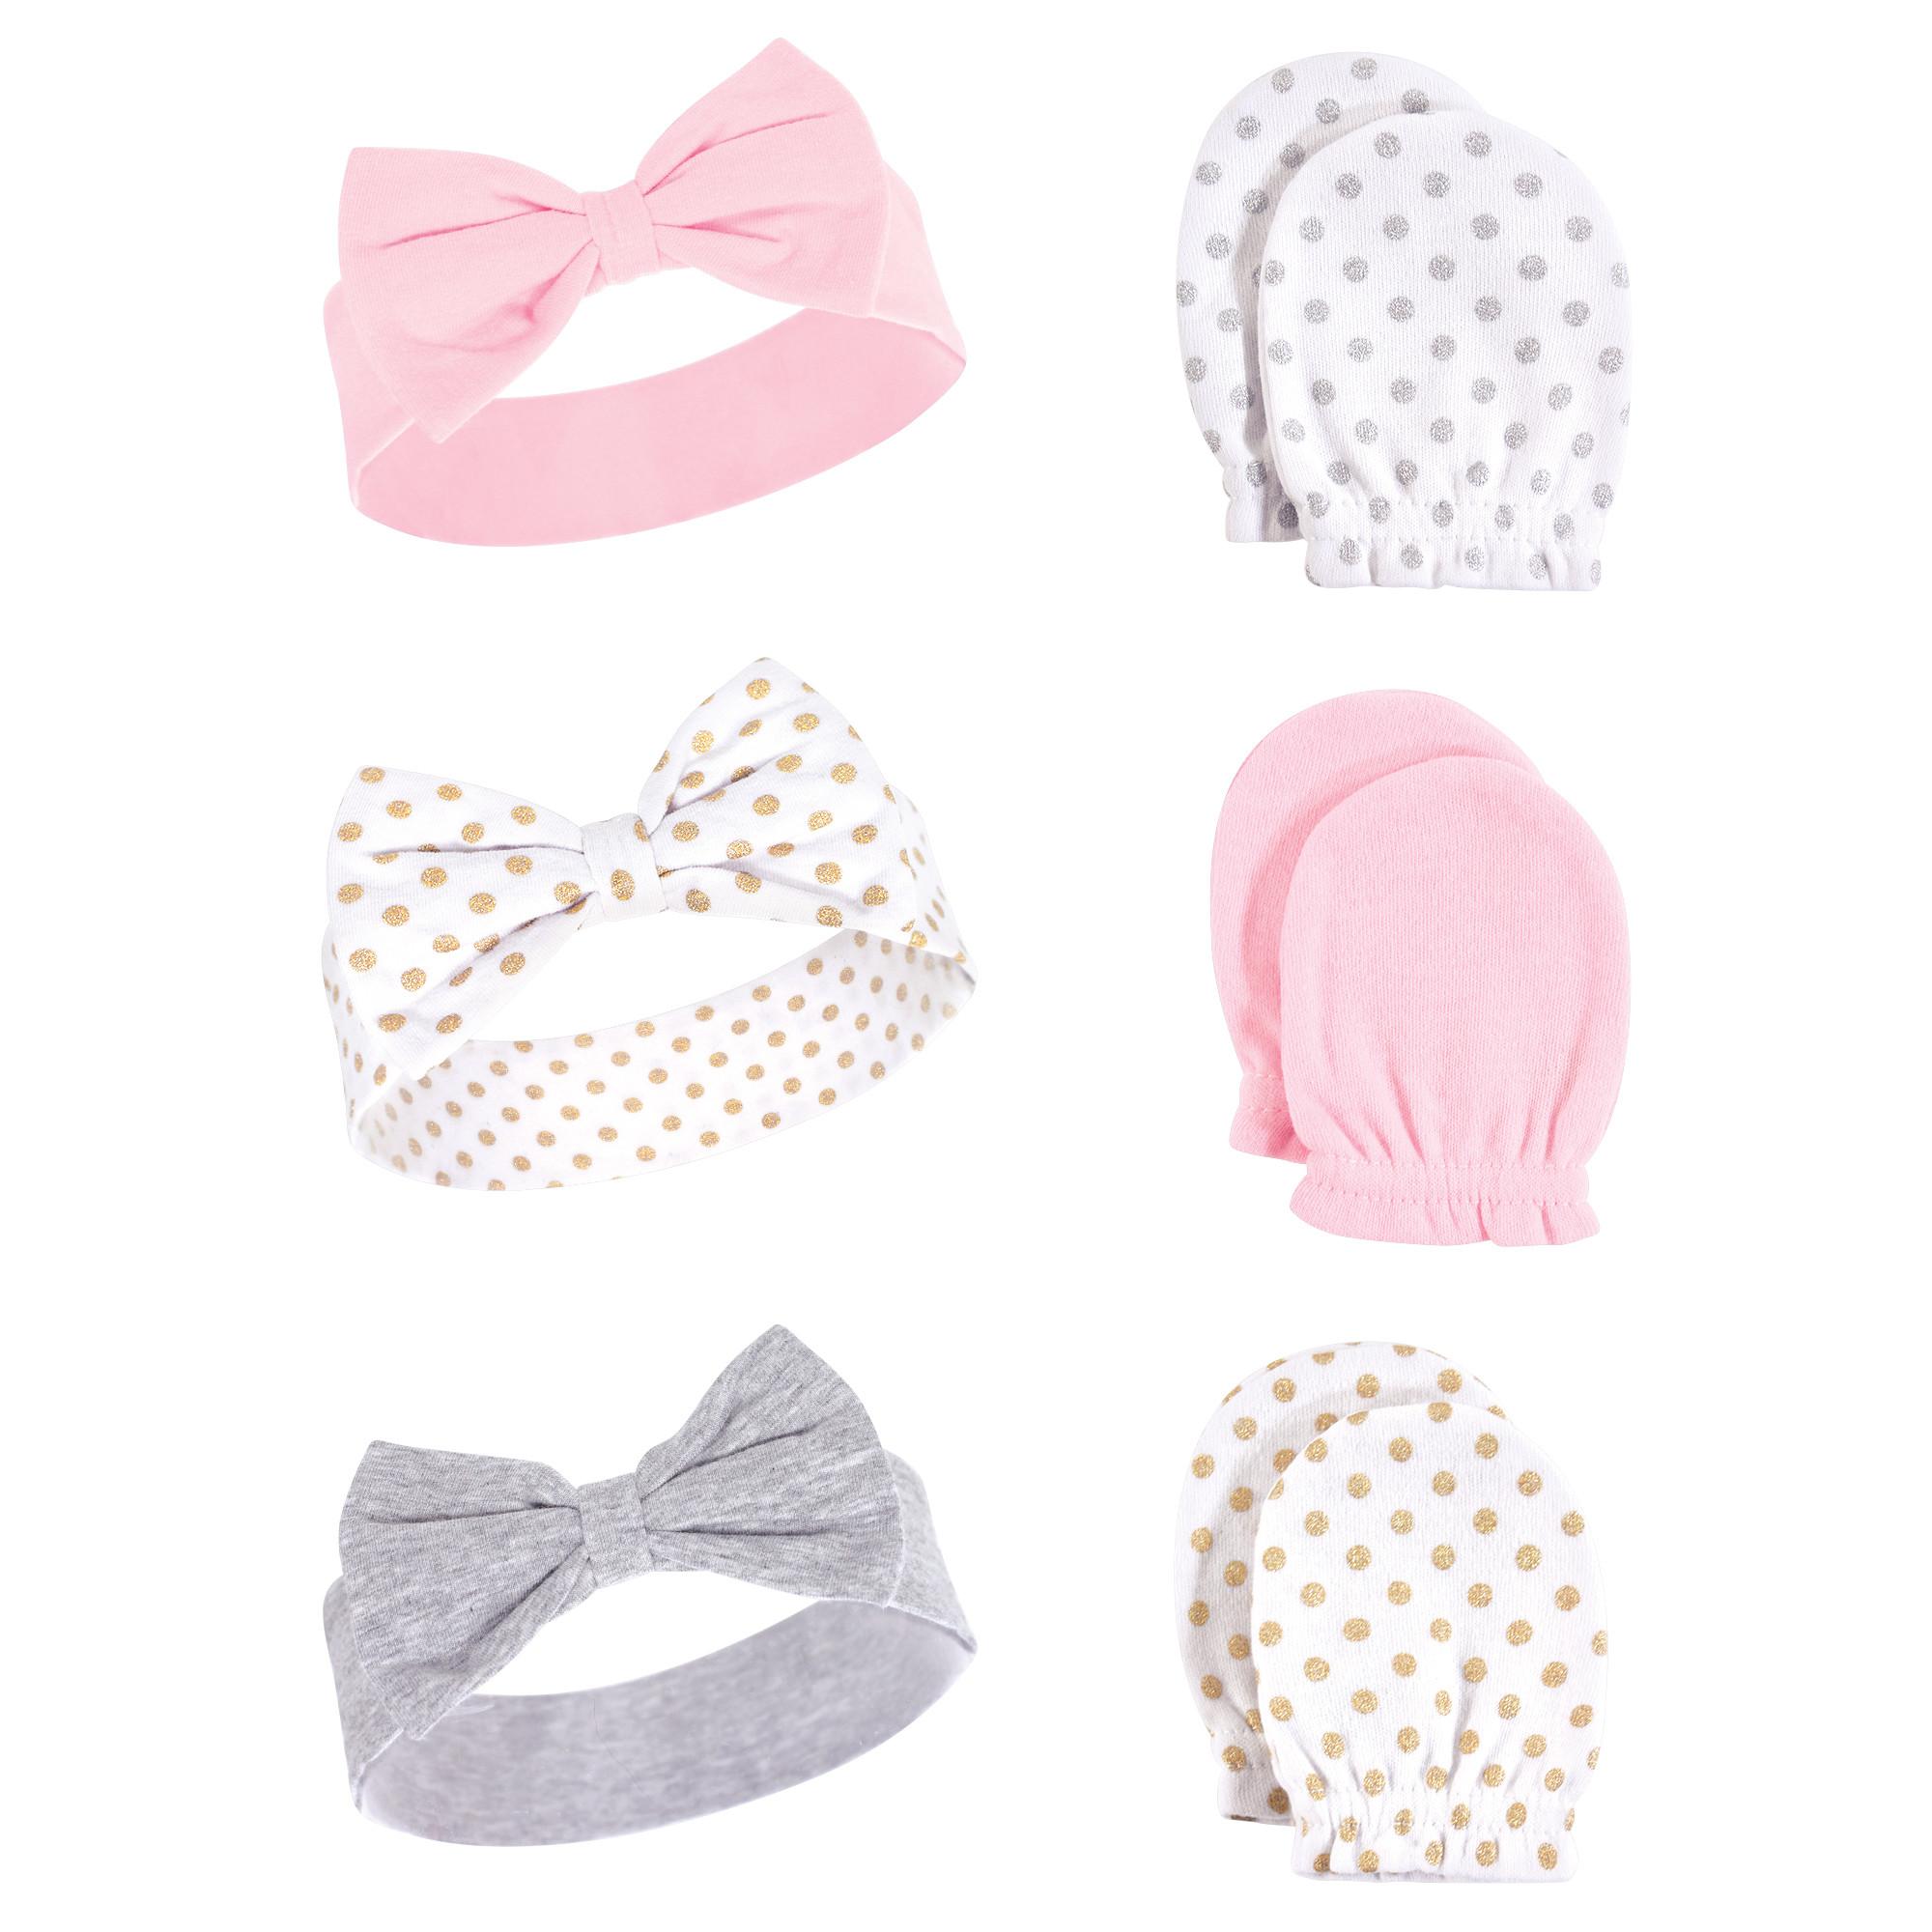 833c837fb84 Baby Headband and Scratch Mittens